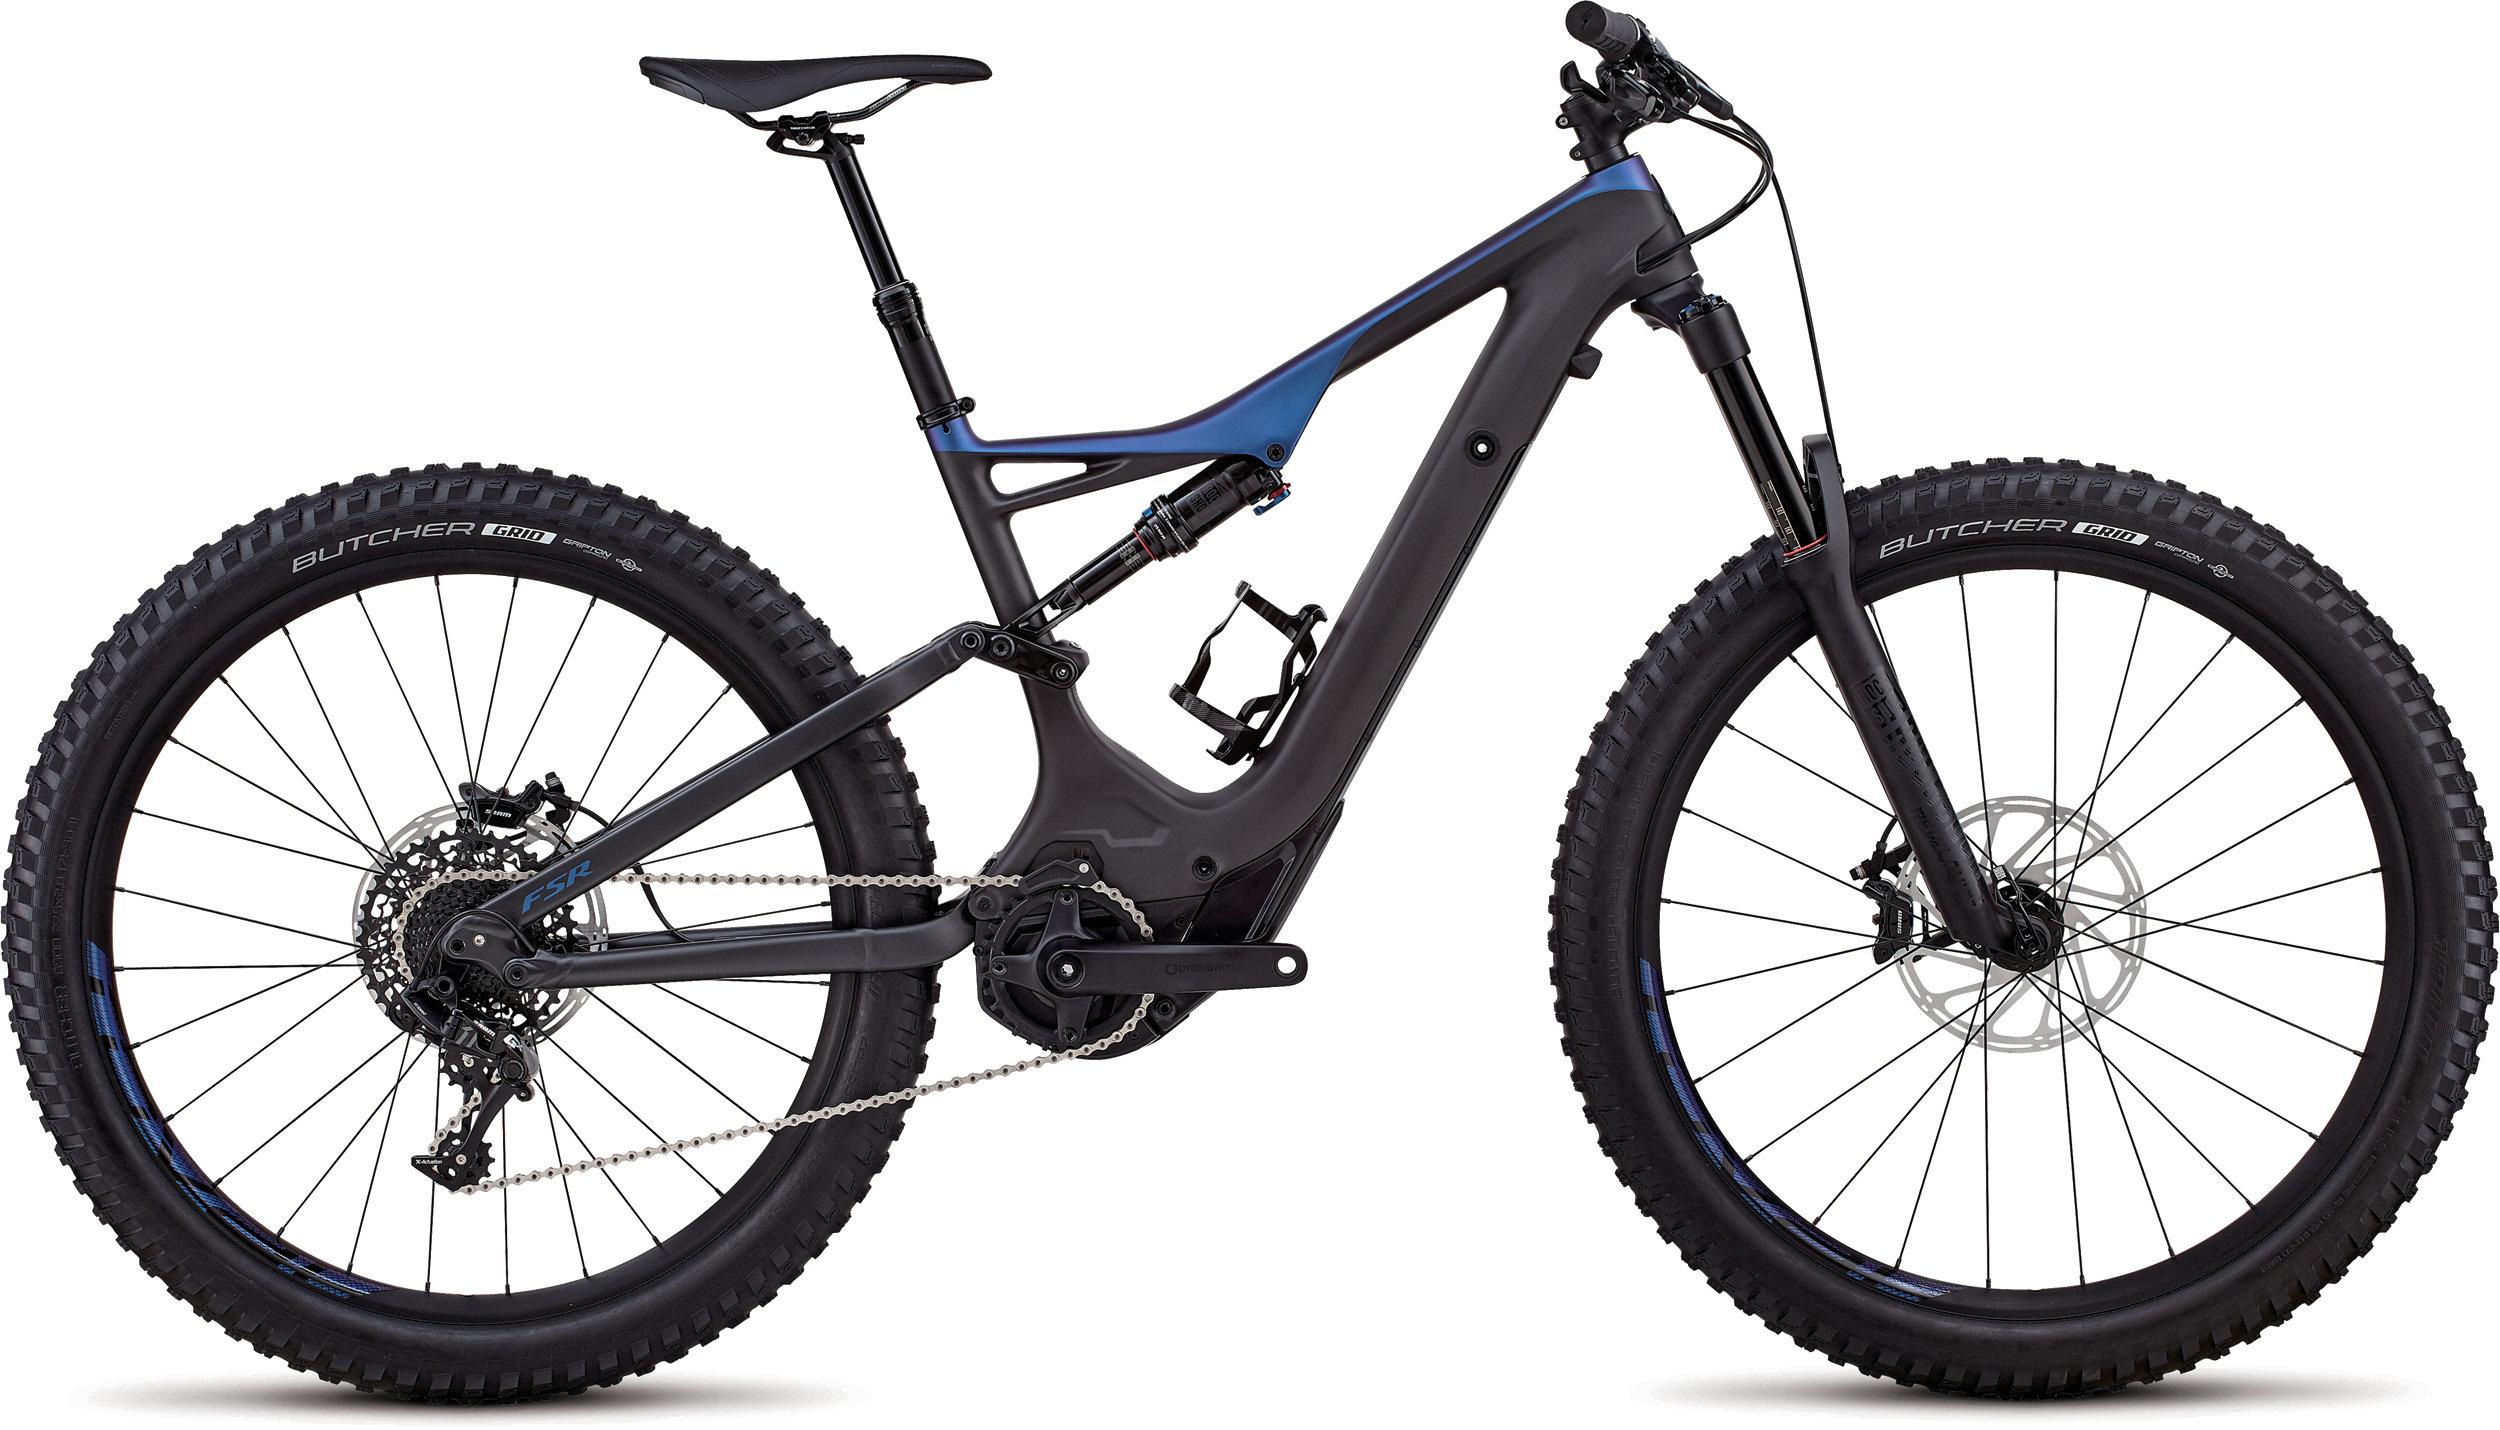 Specialized Men´s Turbo Levo FSR Comp Carbon 6Fattie/29 Satin Carbon / Chameleon L - Randen Bike GmbH